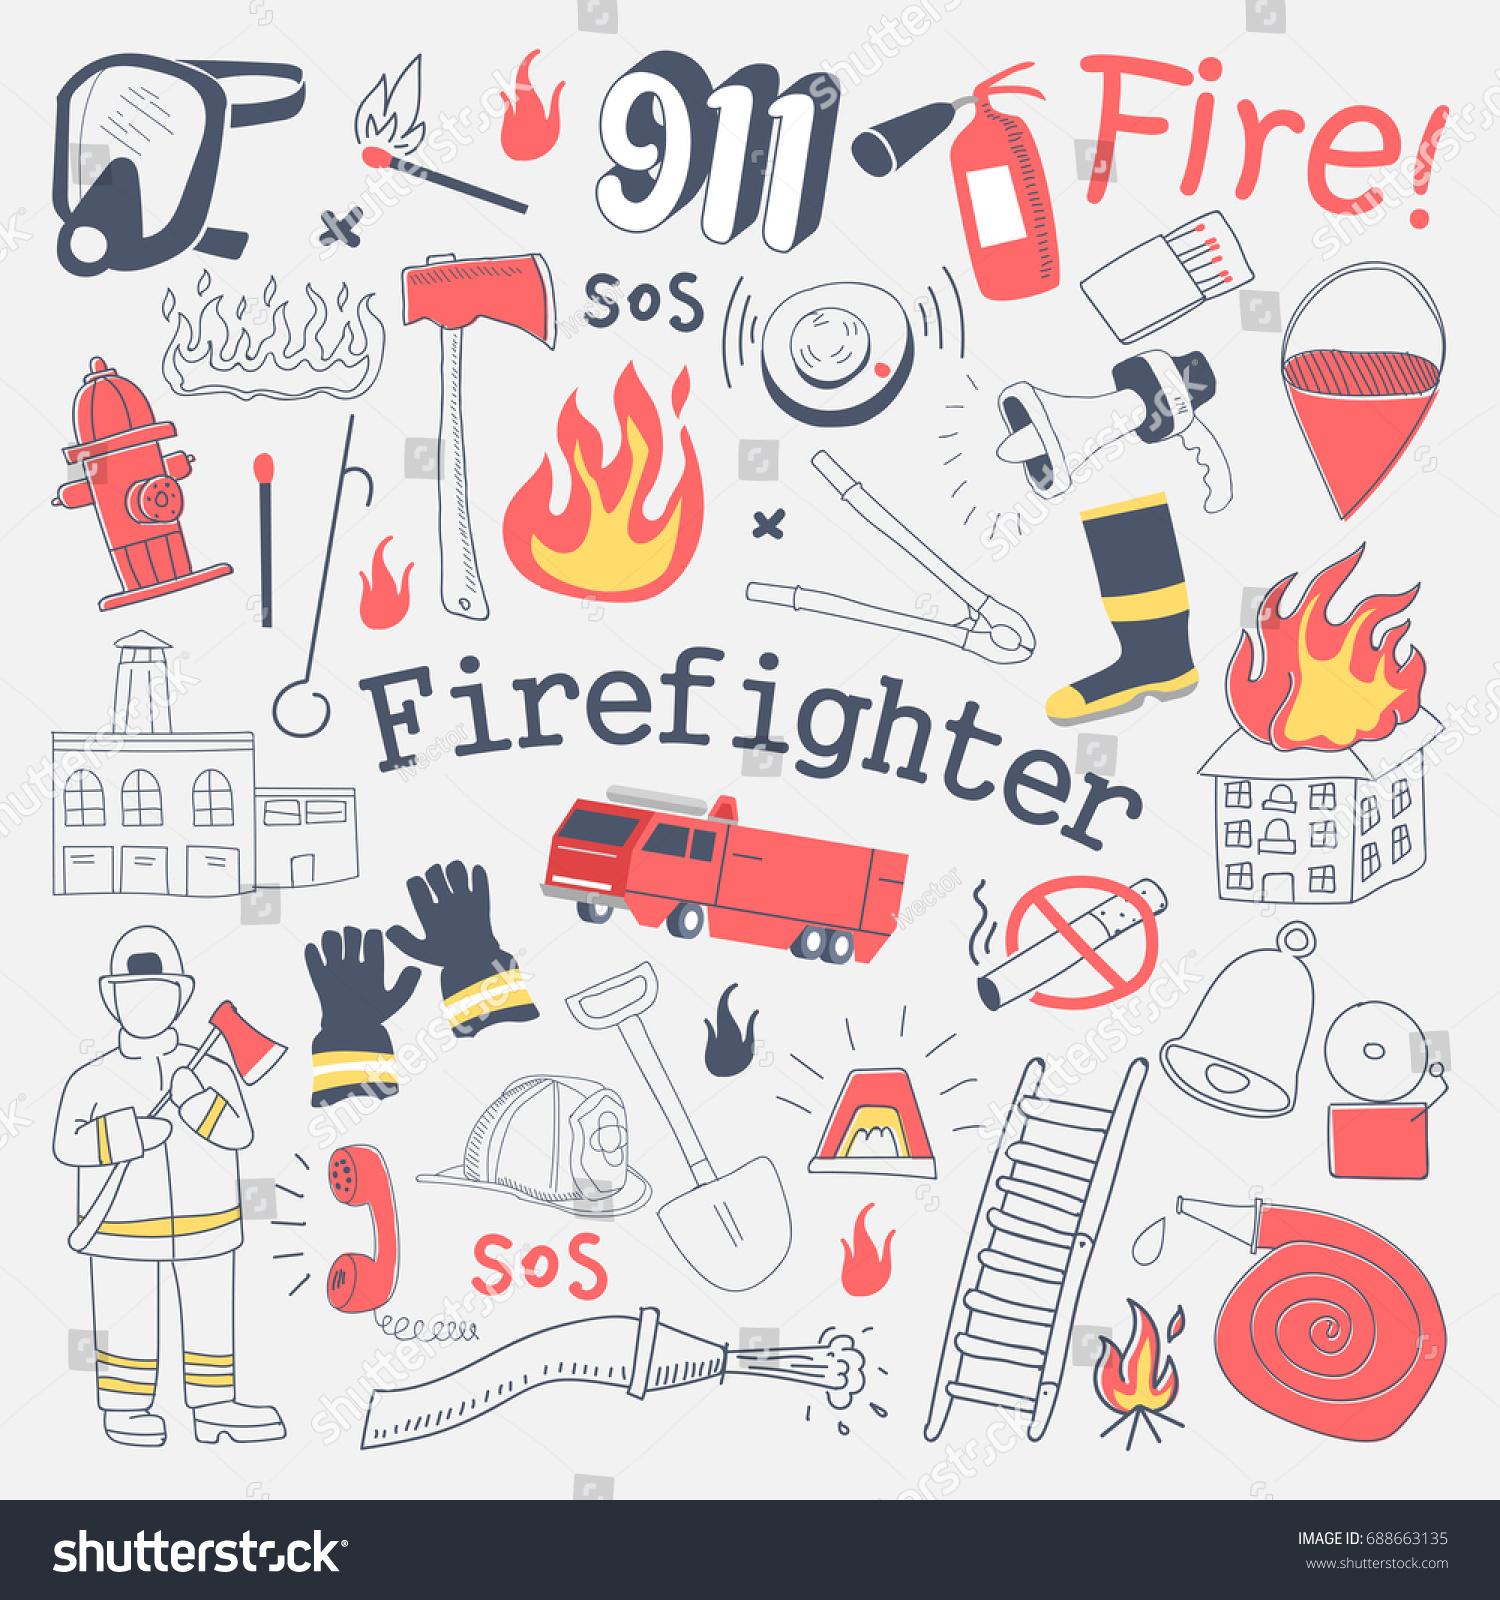 firefighter freehand doodle fireman extinguisher equipment stock